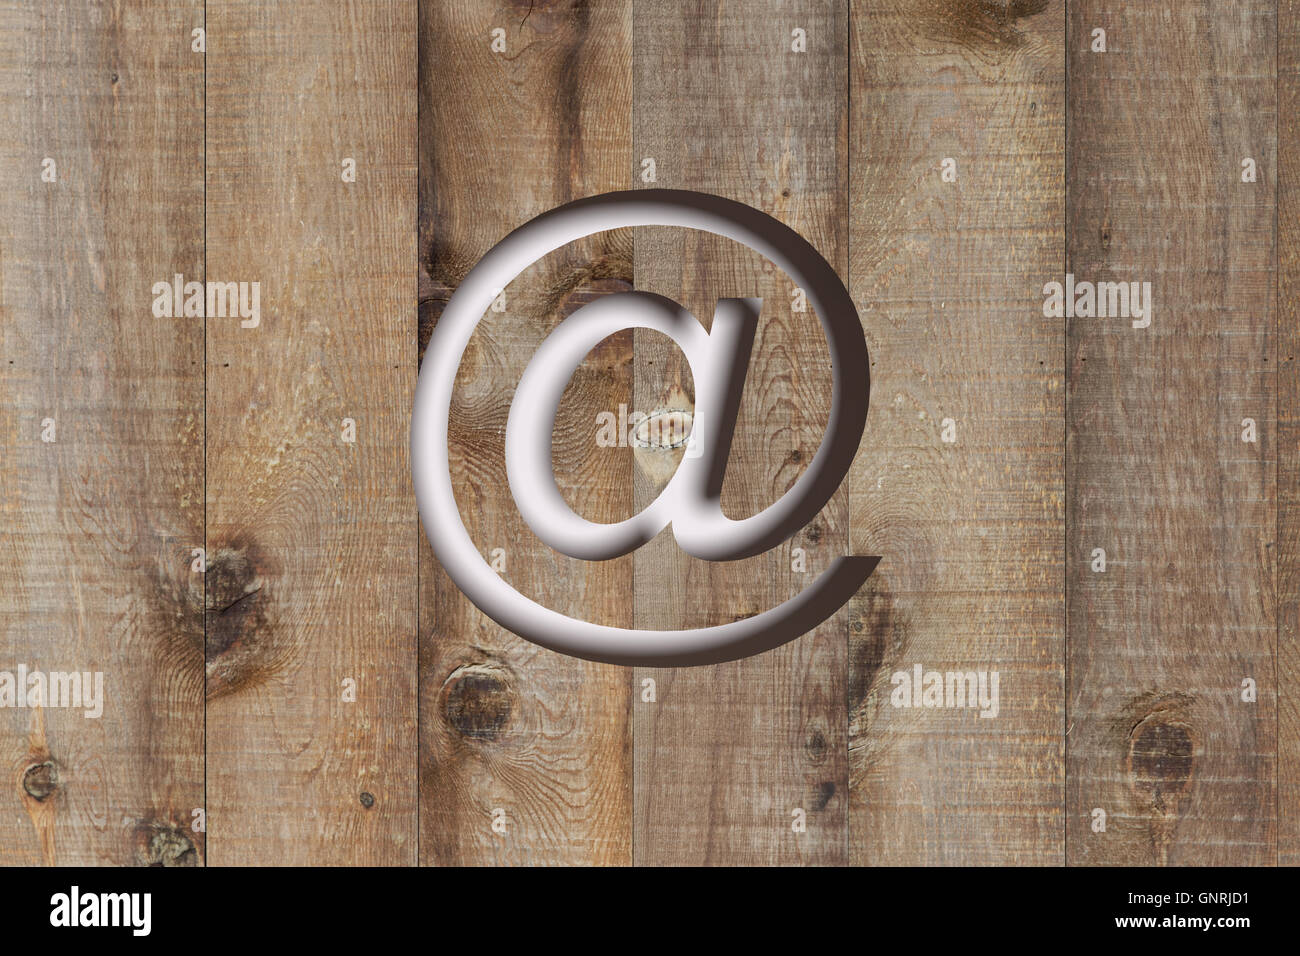 3d Snail Email Address Symbol Stock Photos 3d Snail Email Address